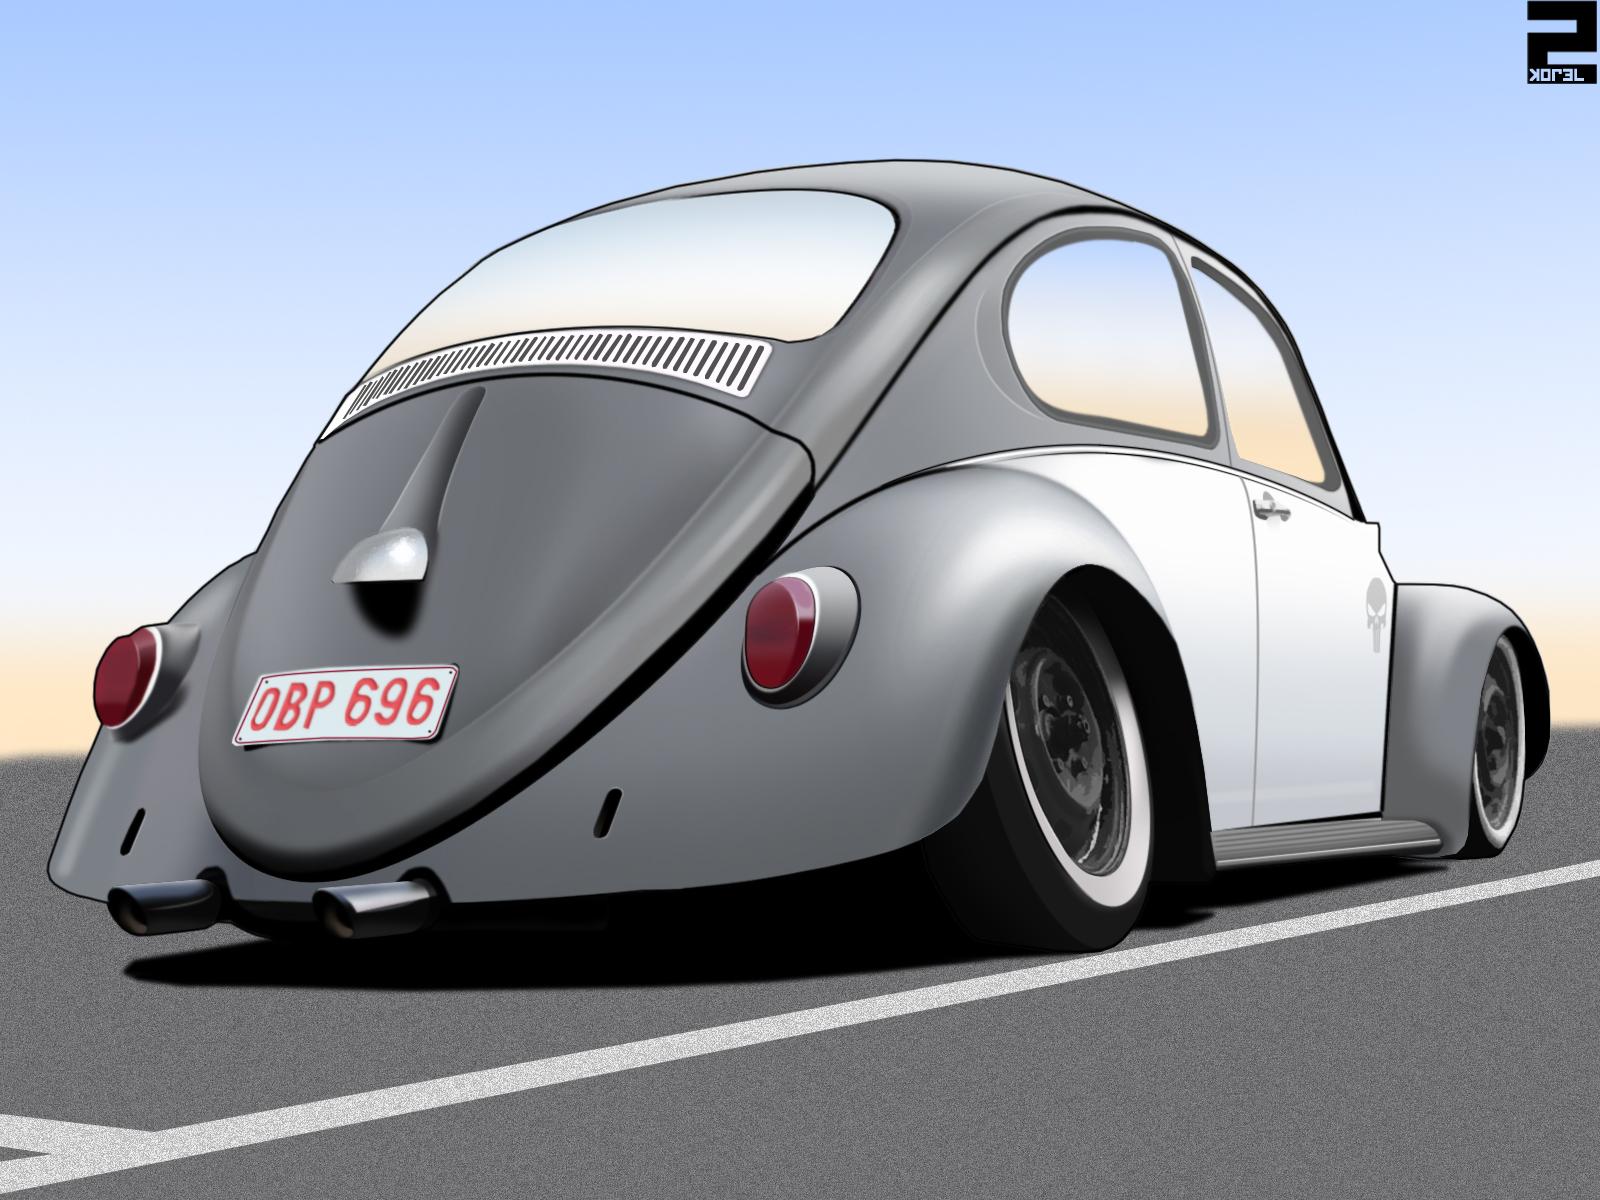 Vw Beetle Wallpaper Hd Download Wallpaper DaWallpaperz 1600x1200